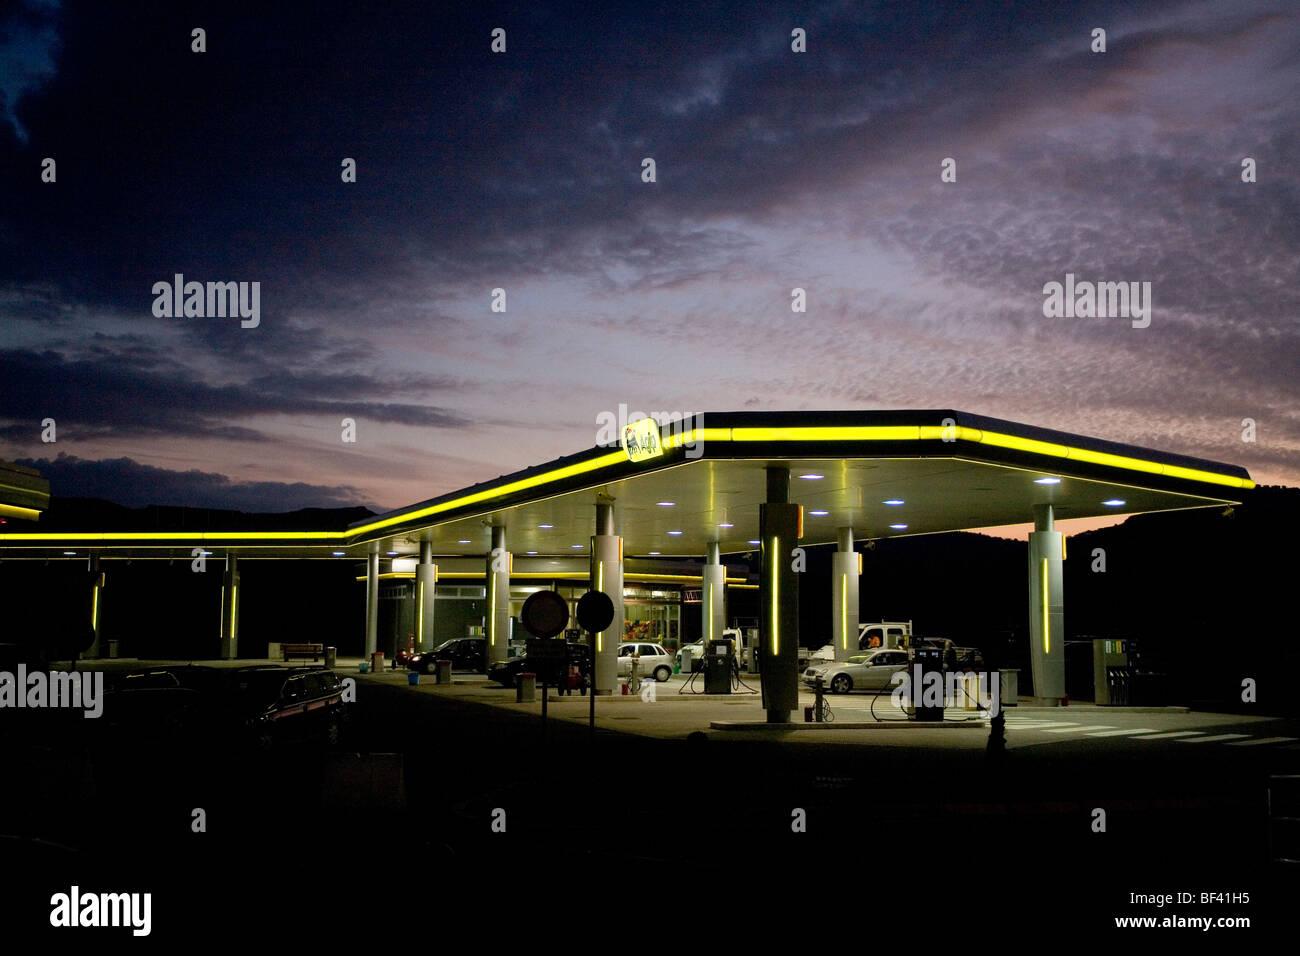 Agip petrol station - Stock Image